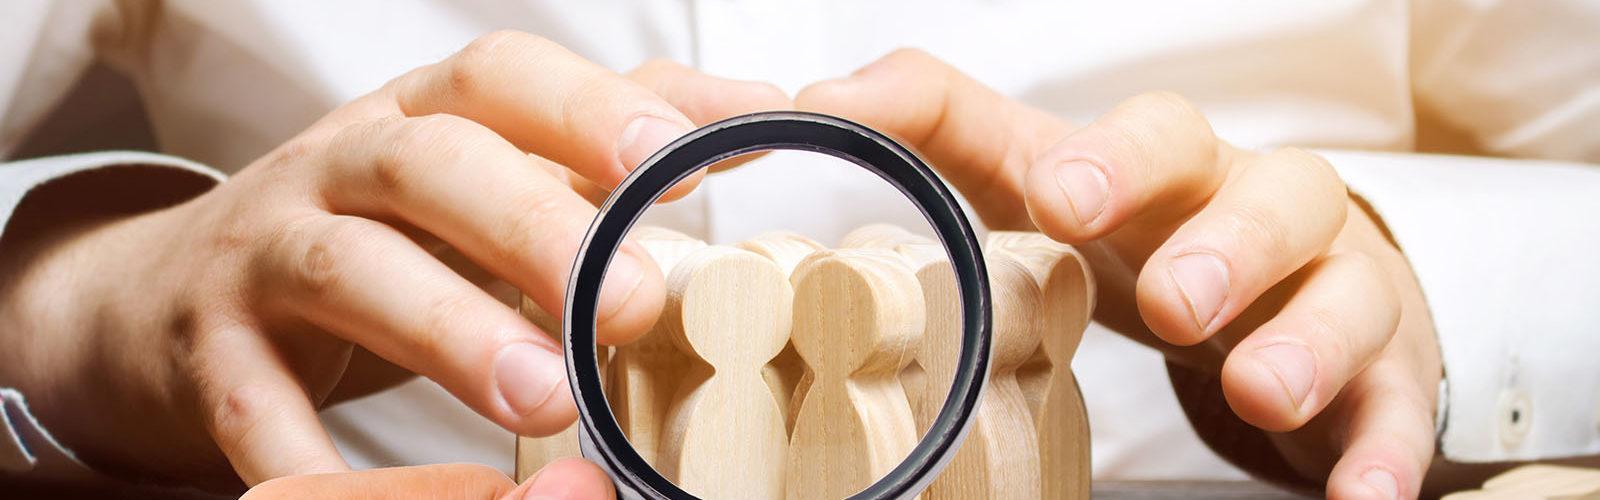 ends around wooden peg - choosing employee - 305598436_web.jpg